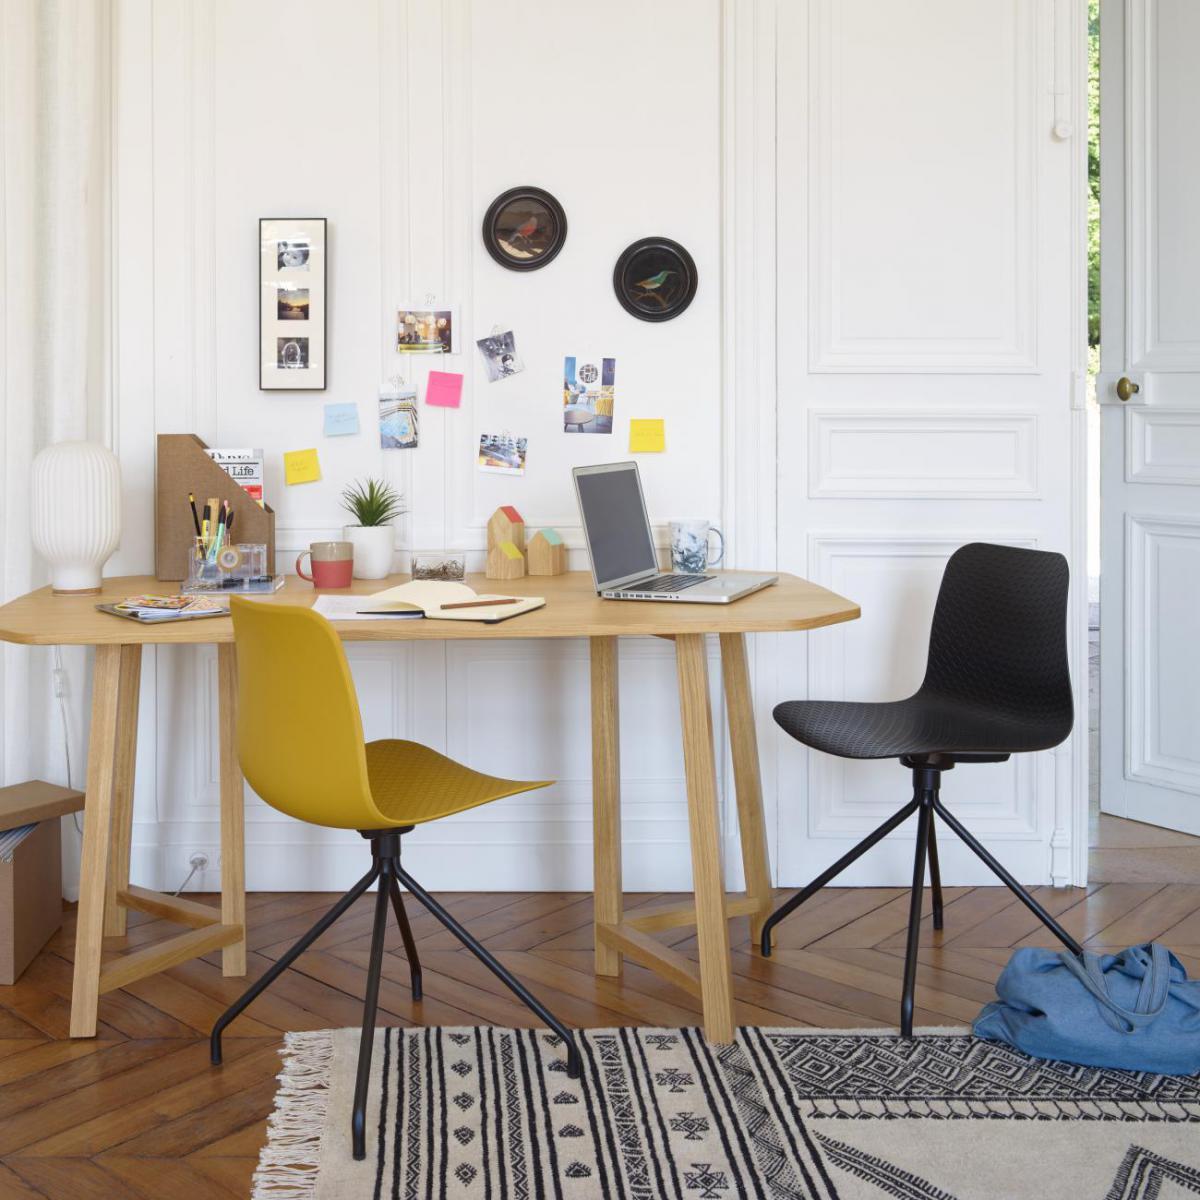 habitat console affordable console habitat naos vintage. Black Bedroom Furniture Sets. Home Design Ideas